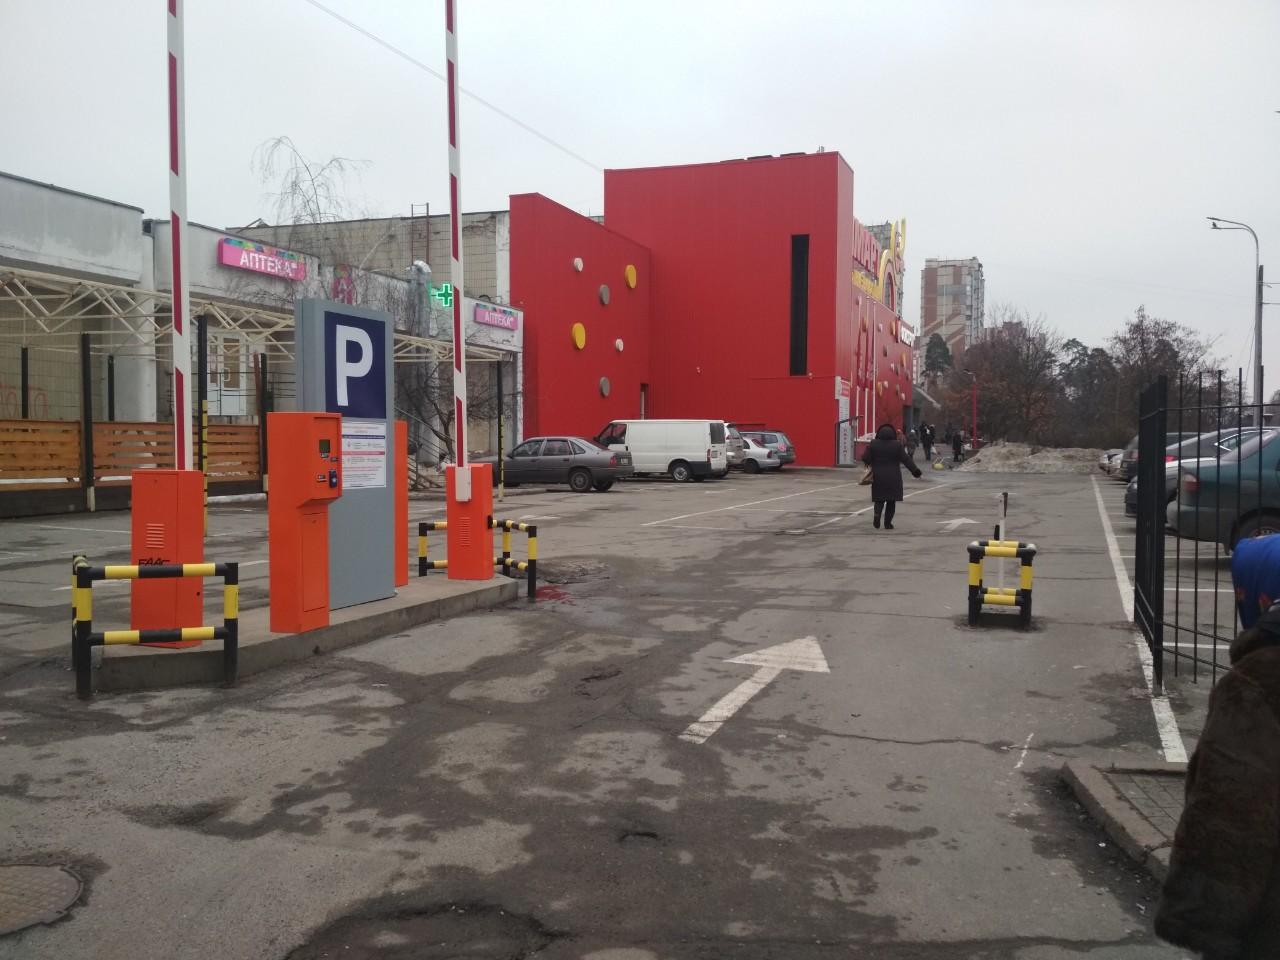 автоматический паркинг, паркомат, купить паркомат, купить паркинг